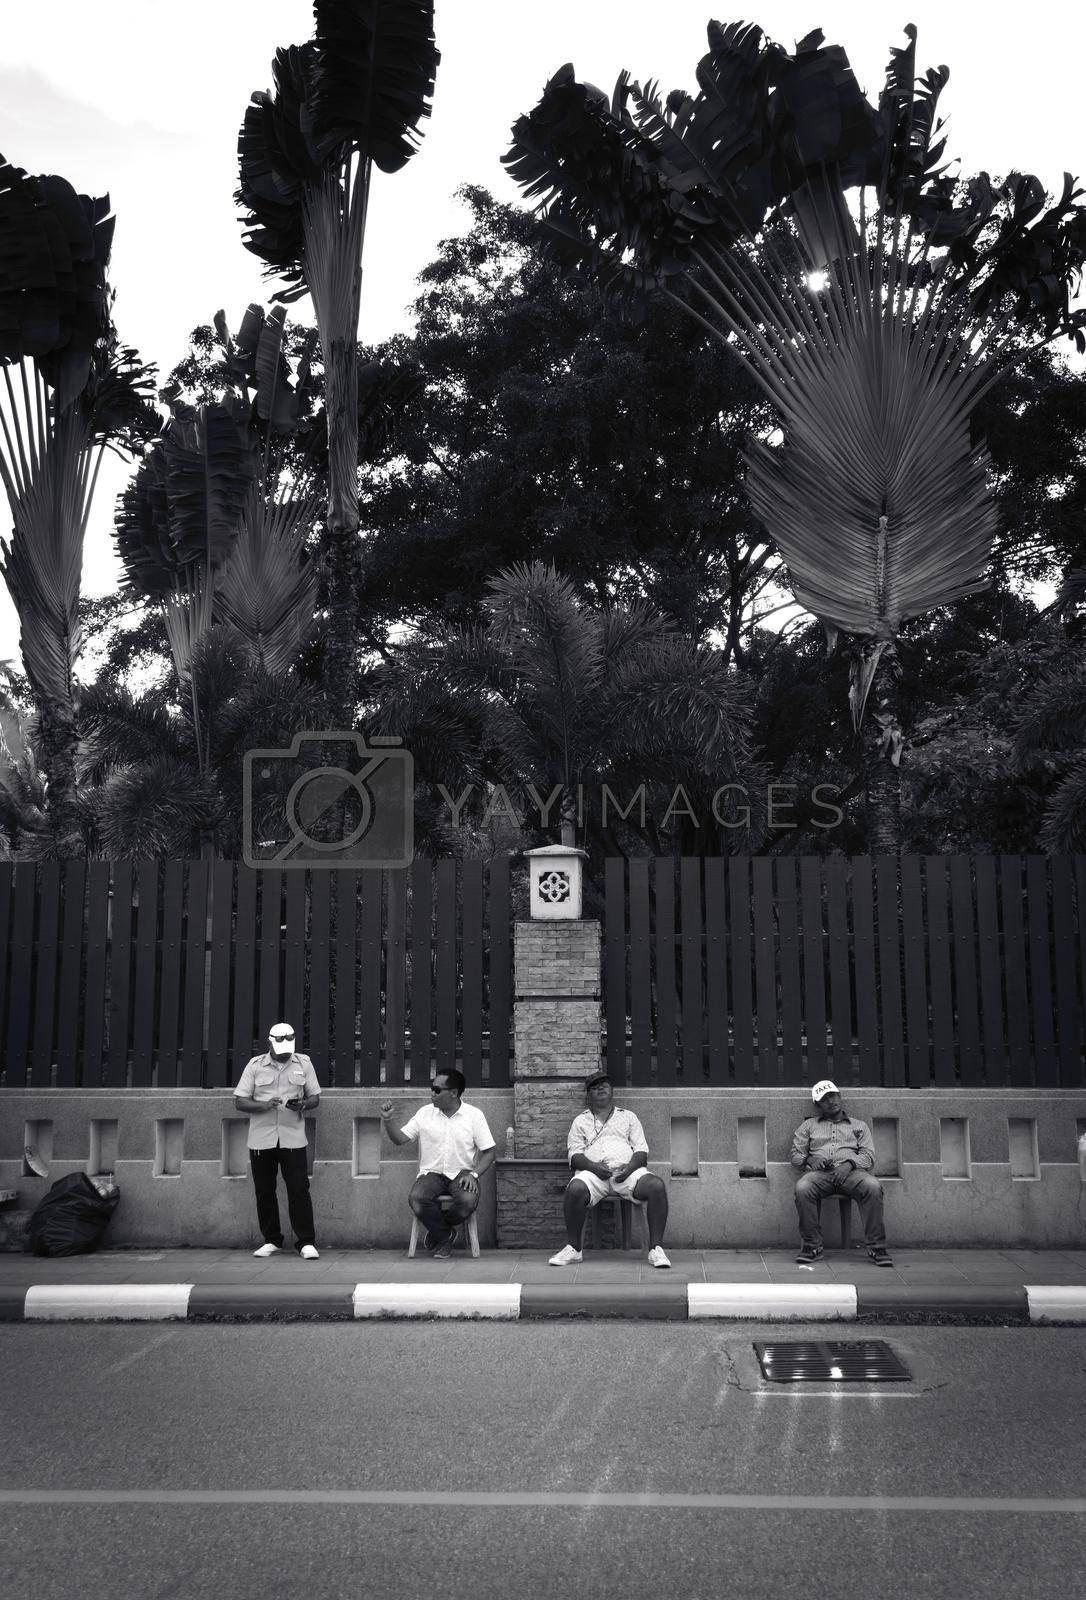 Royalty free image of 2019-11-05 / Phuket, Thailand - Four sitting men idling on the sidewalk. Black and white. by hernan_hyper